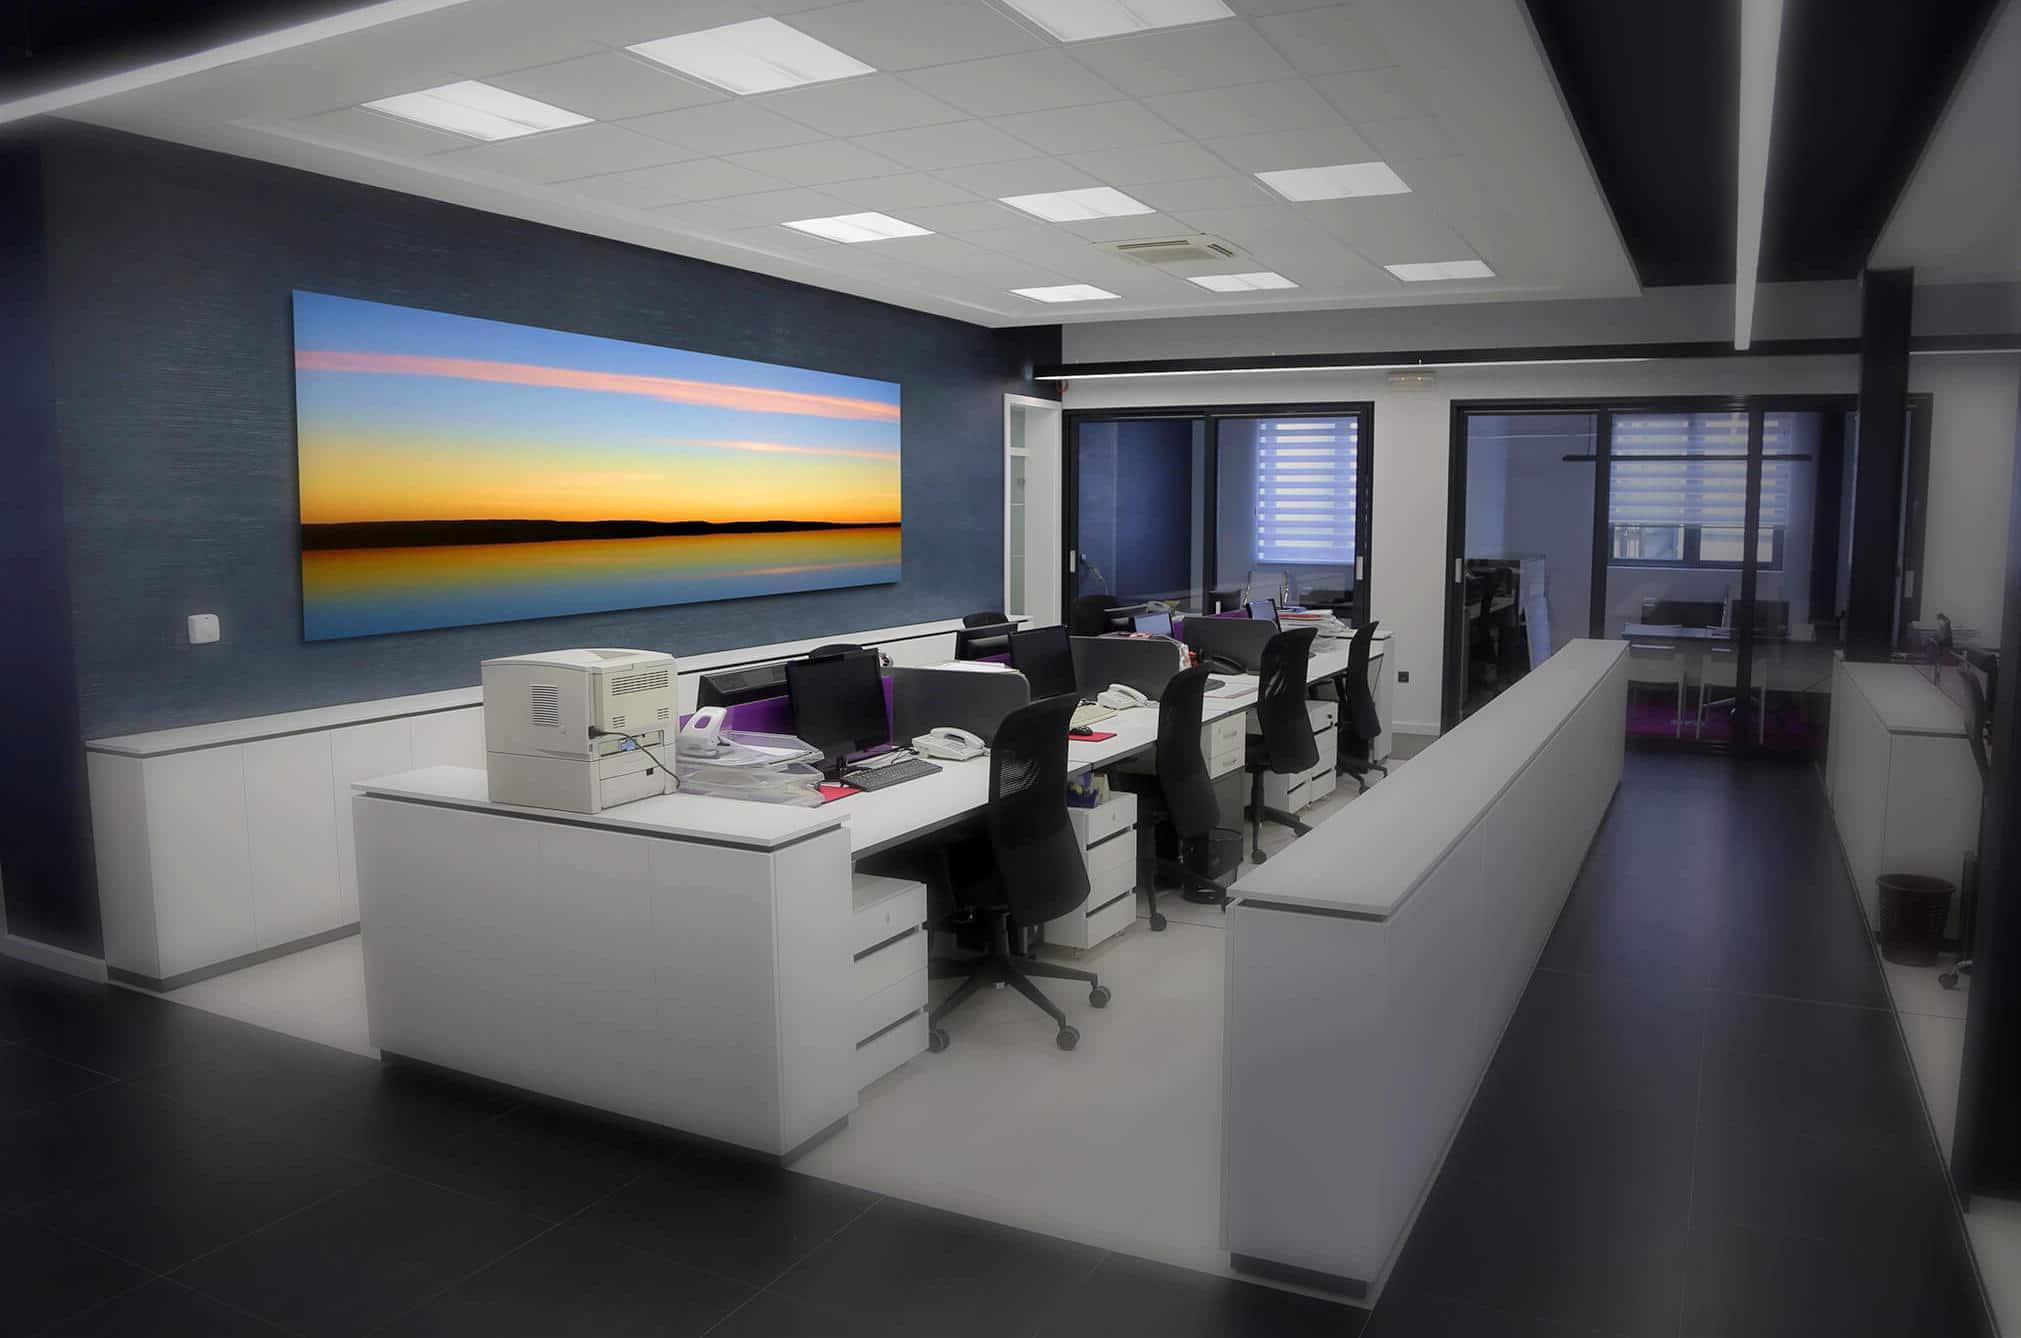 Office Wall Decor Wallpaper